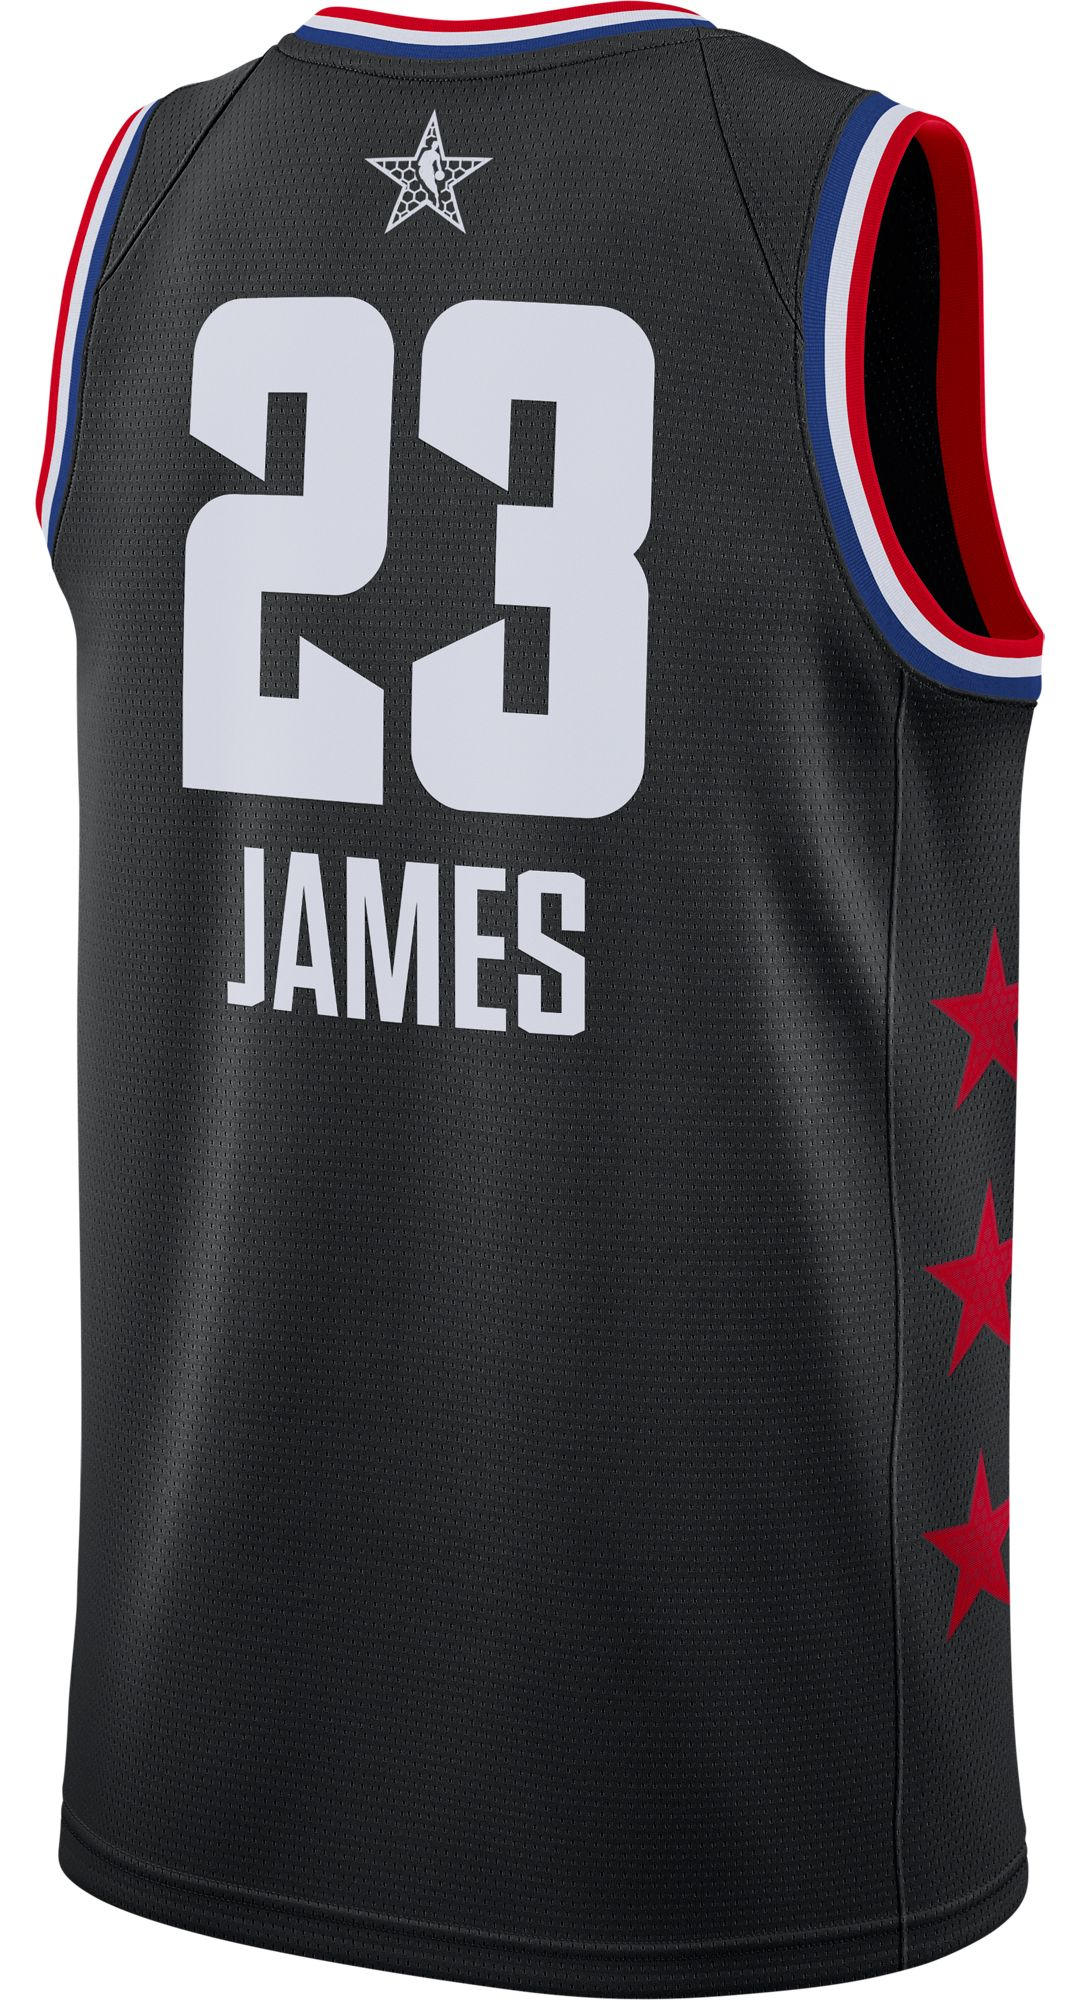 6cfcf08da31 Jordan Men s 2019 NBA All-Star Game LeBron James Black Dri-FIT Swingman  Jersey